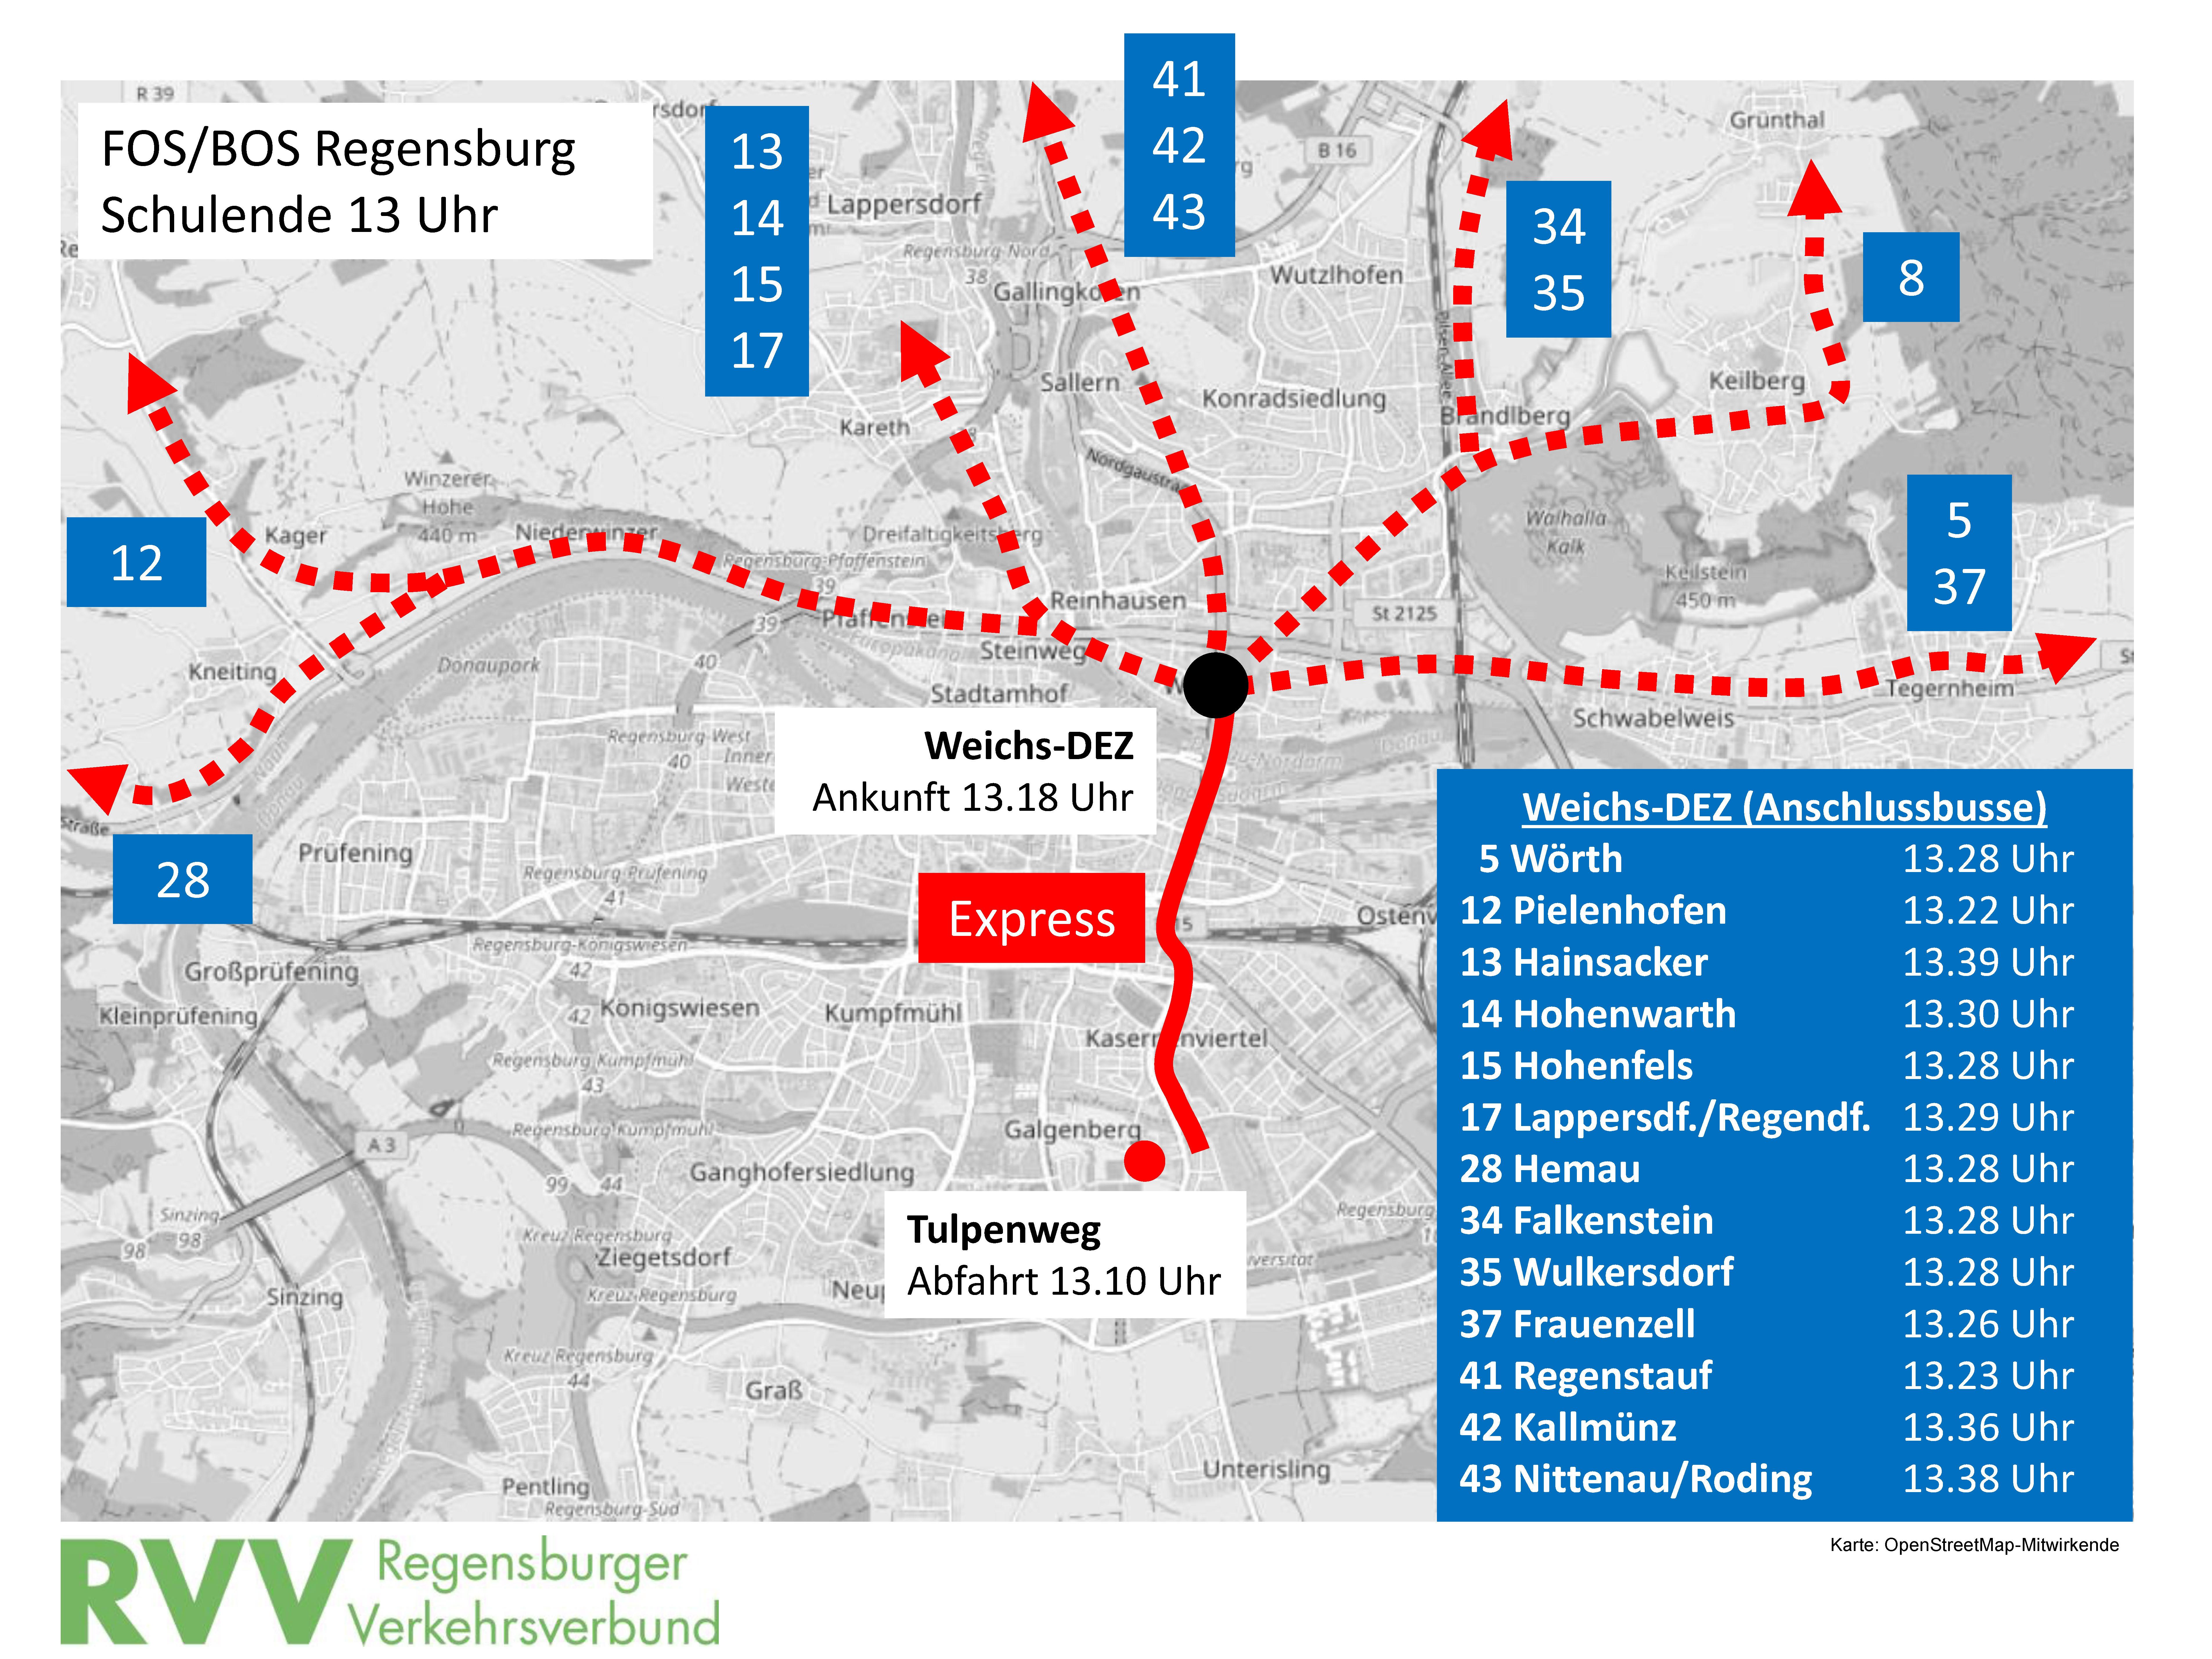 seit 2 mai neue expressbus verbindung f r sch ler der fos bos regensburg regensburger. Black Bedroom Furniture Sets. Home Design Ideas